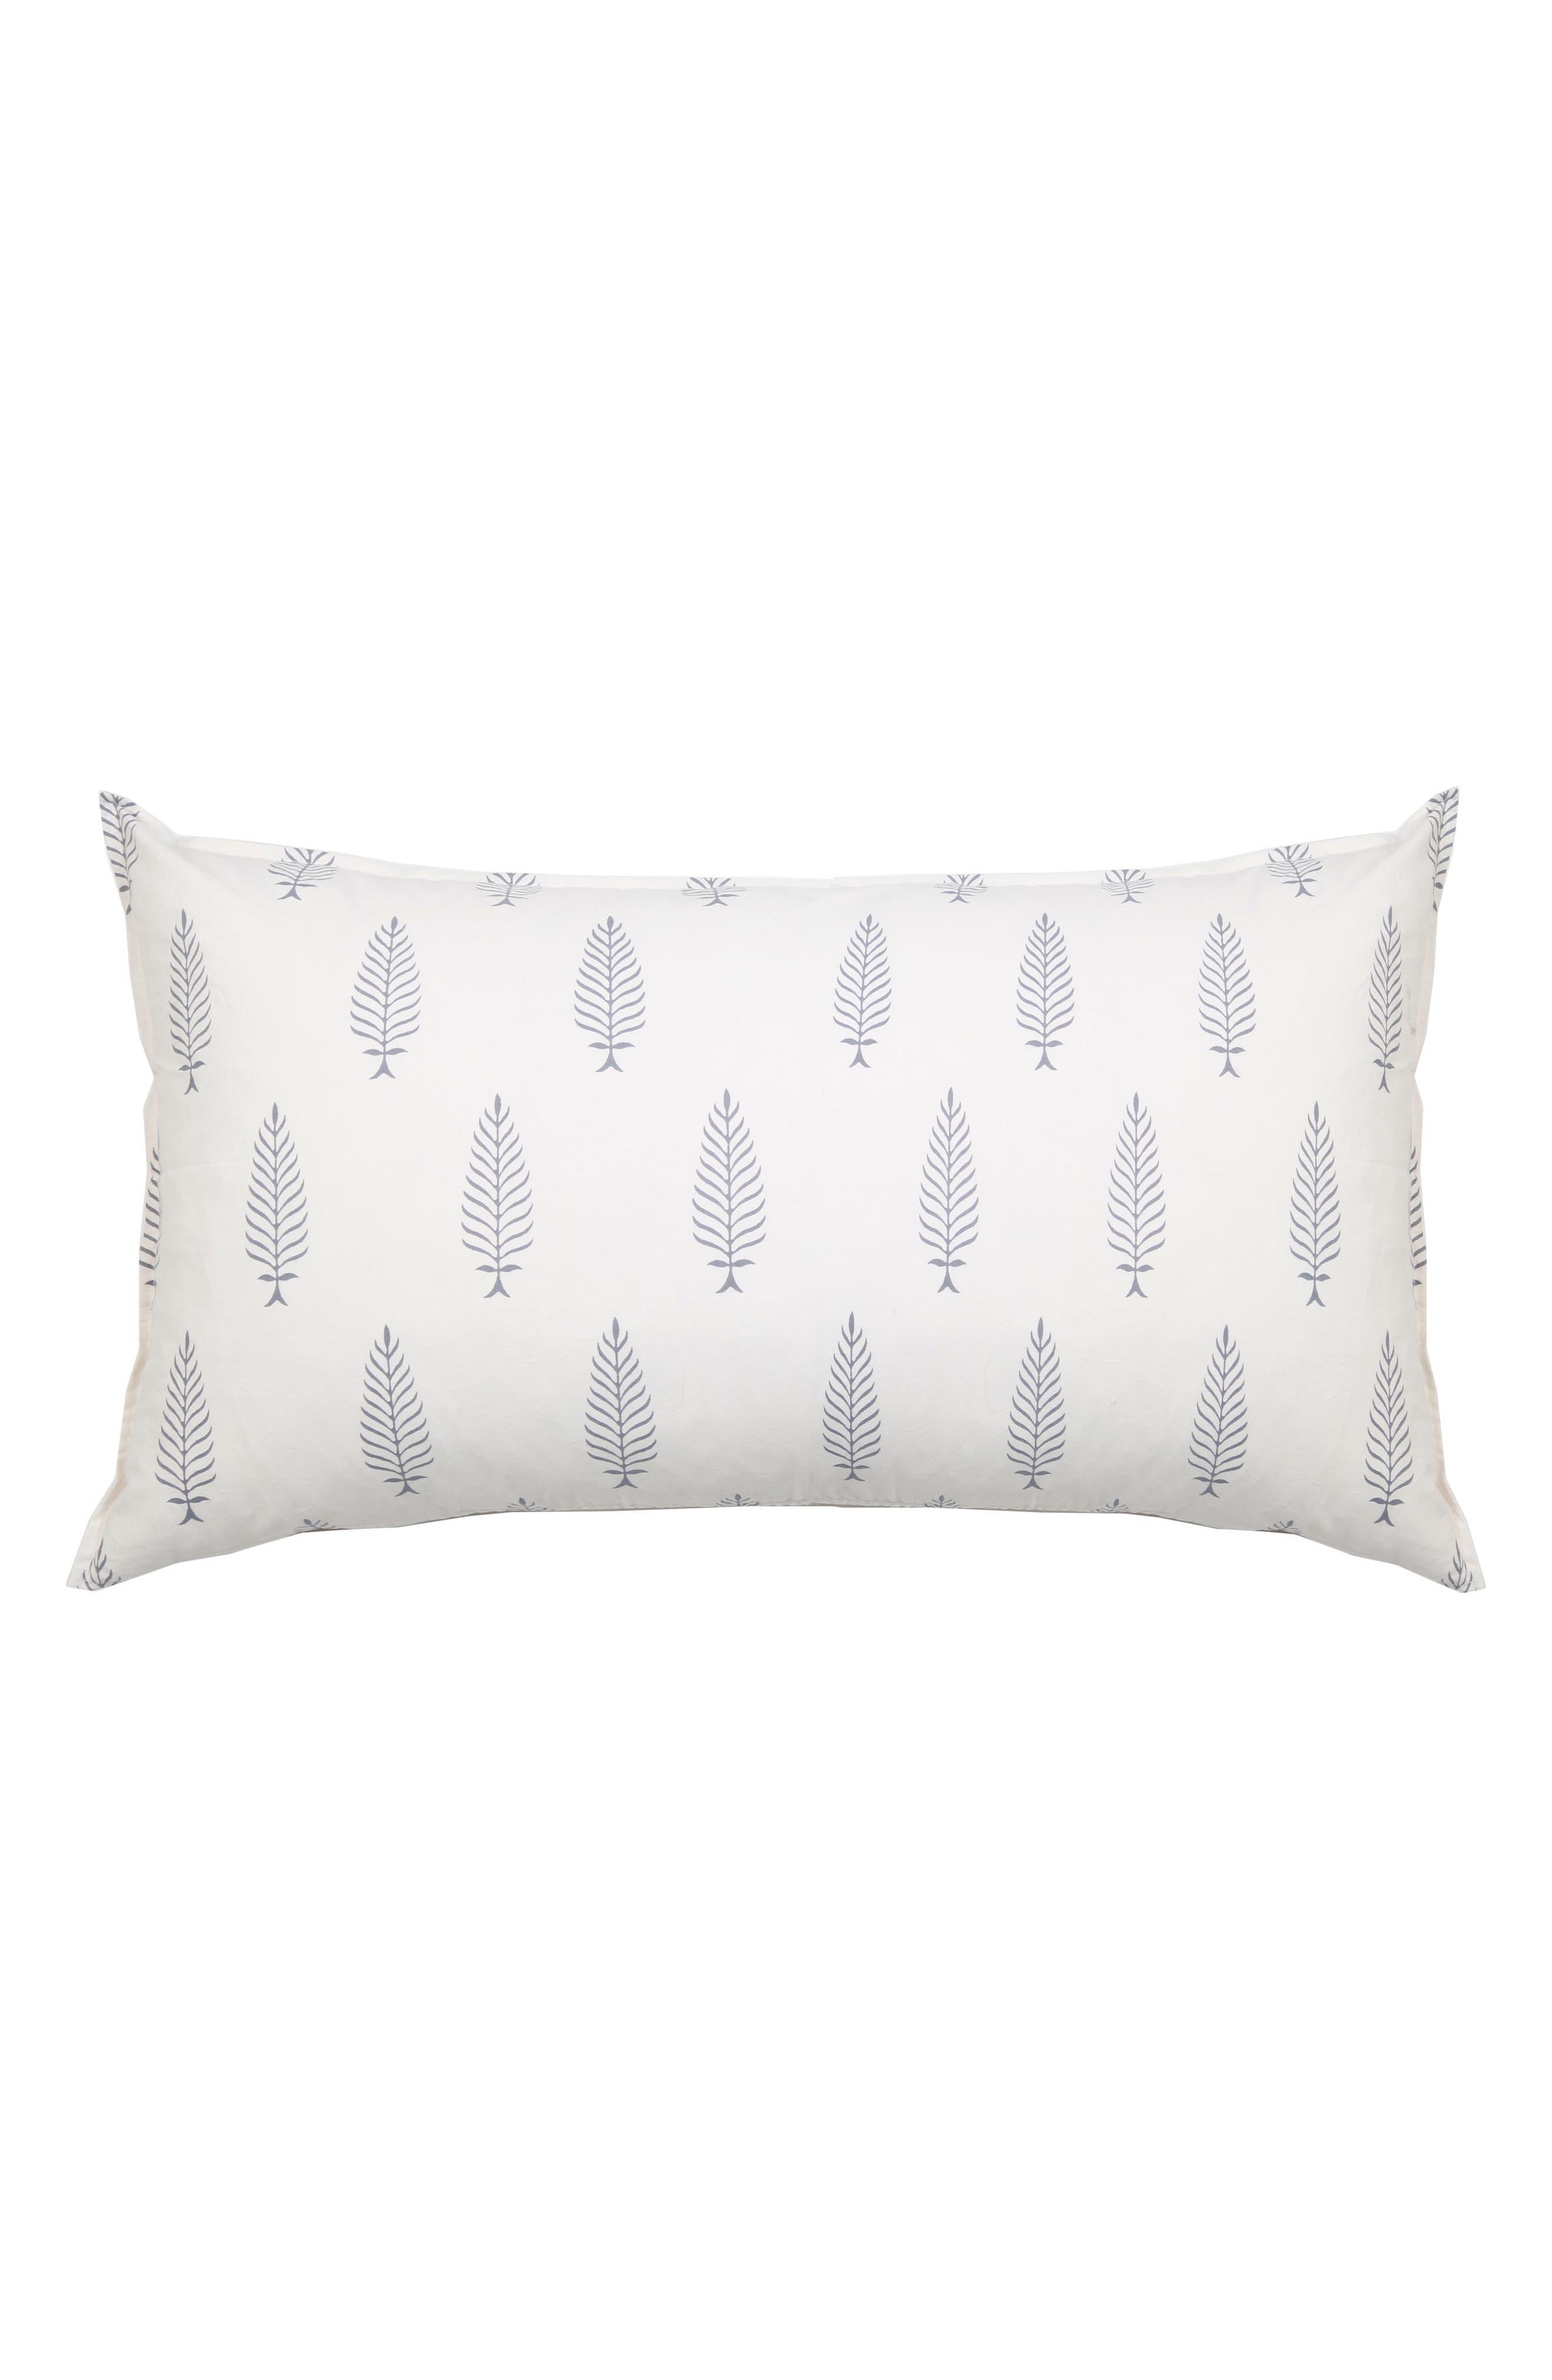 Kiara Accent Pillow,                         Main,                         color, 400